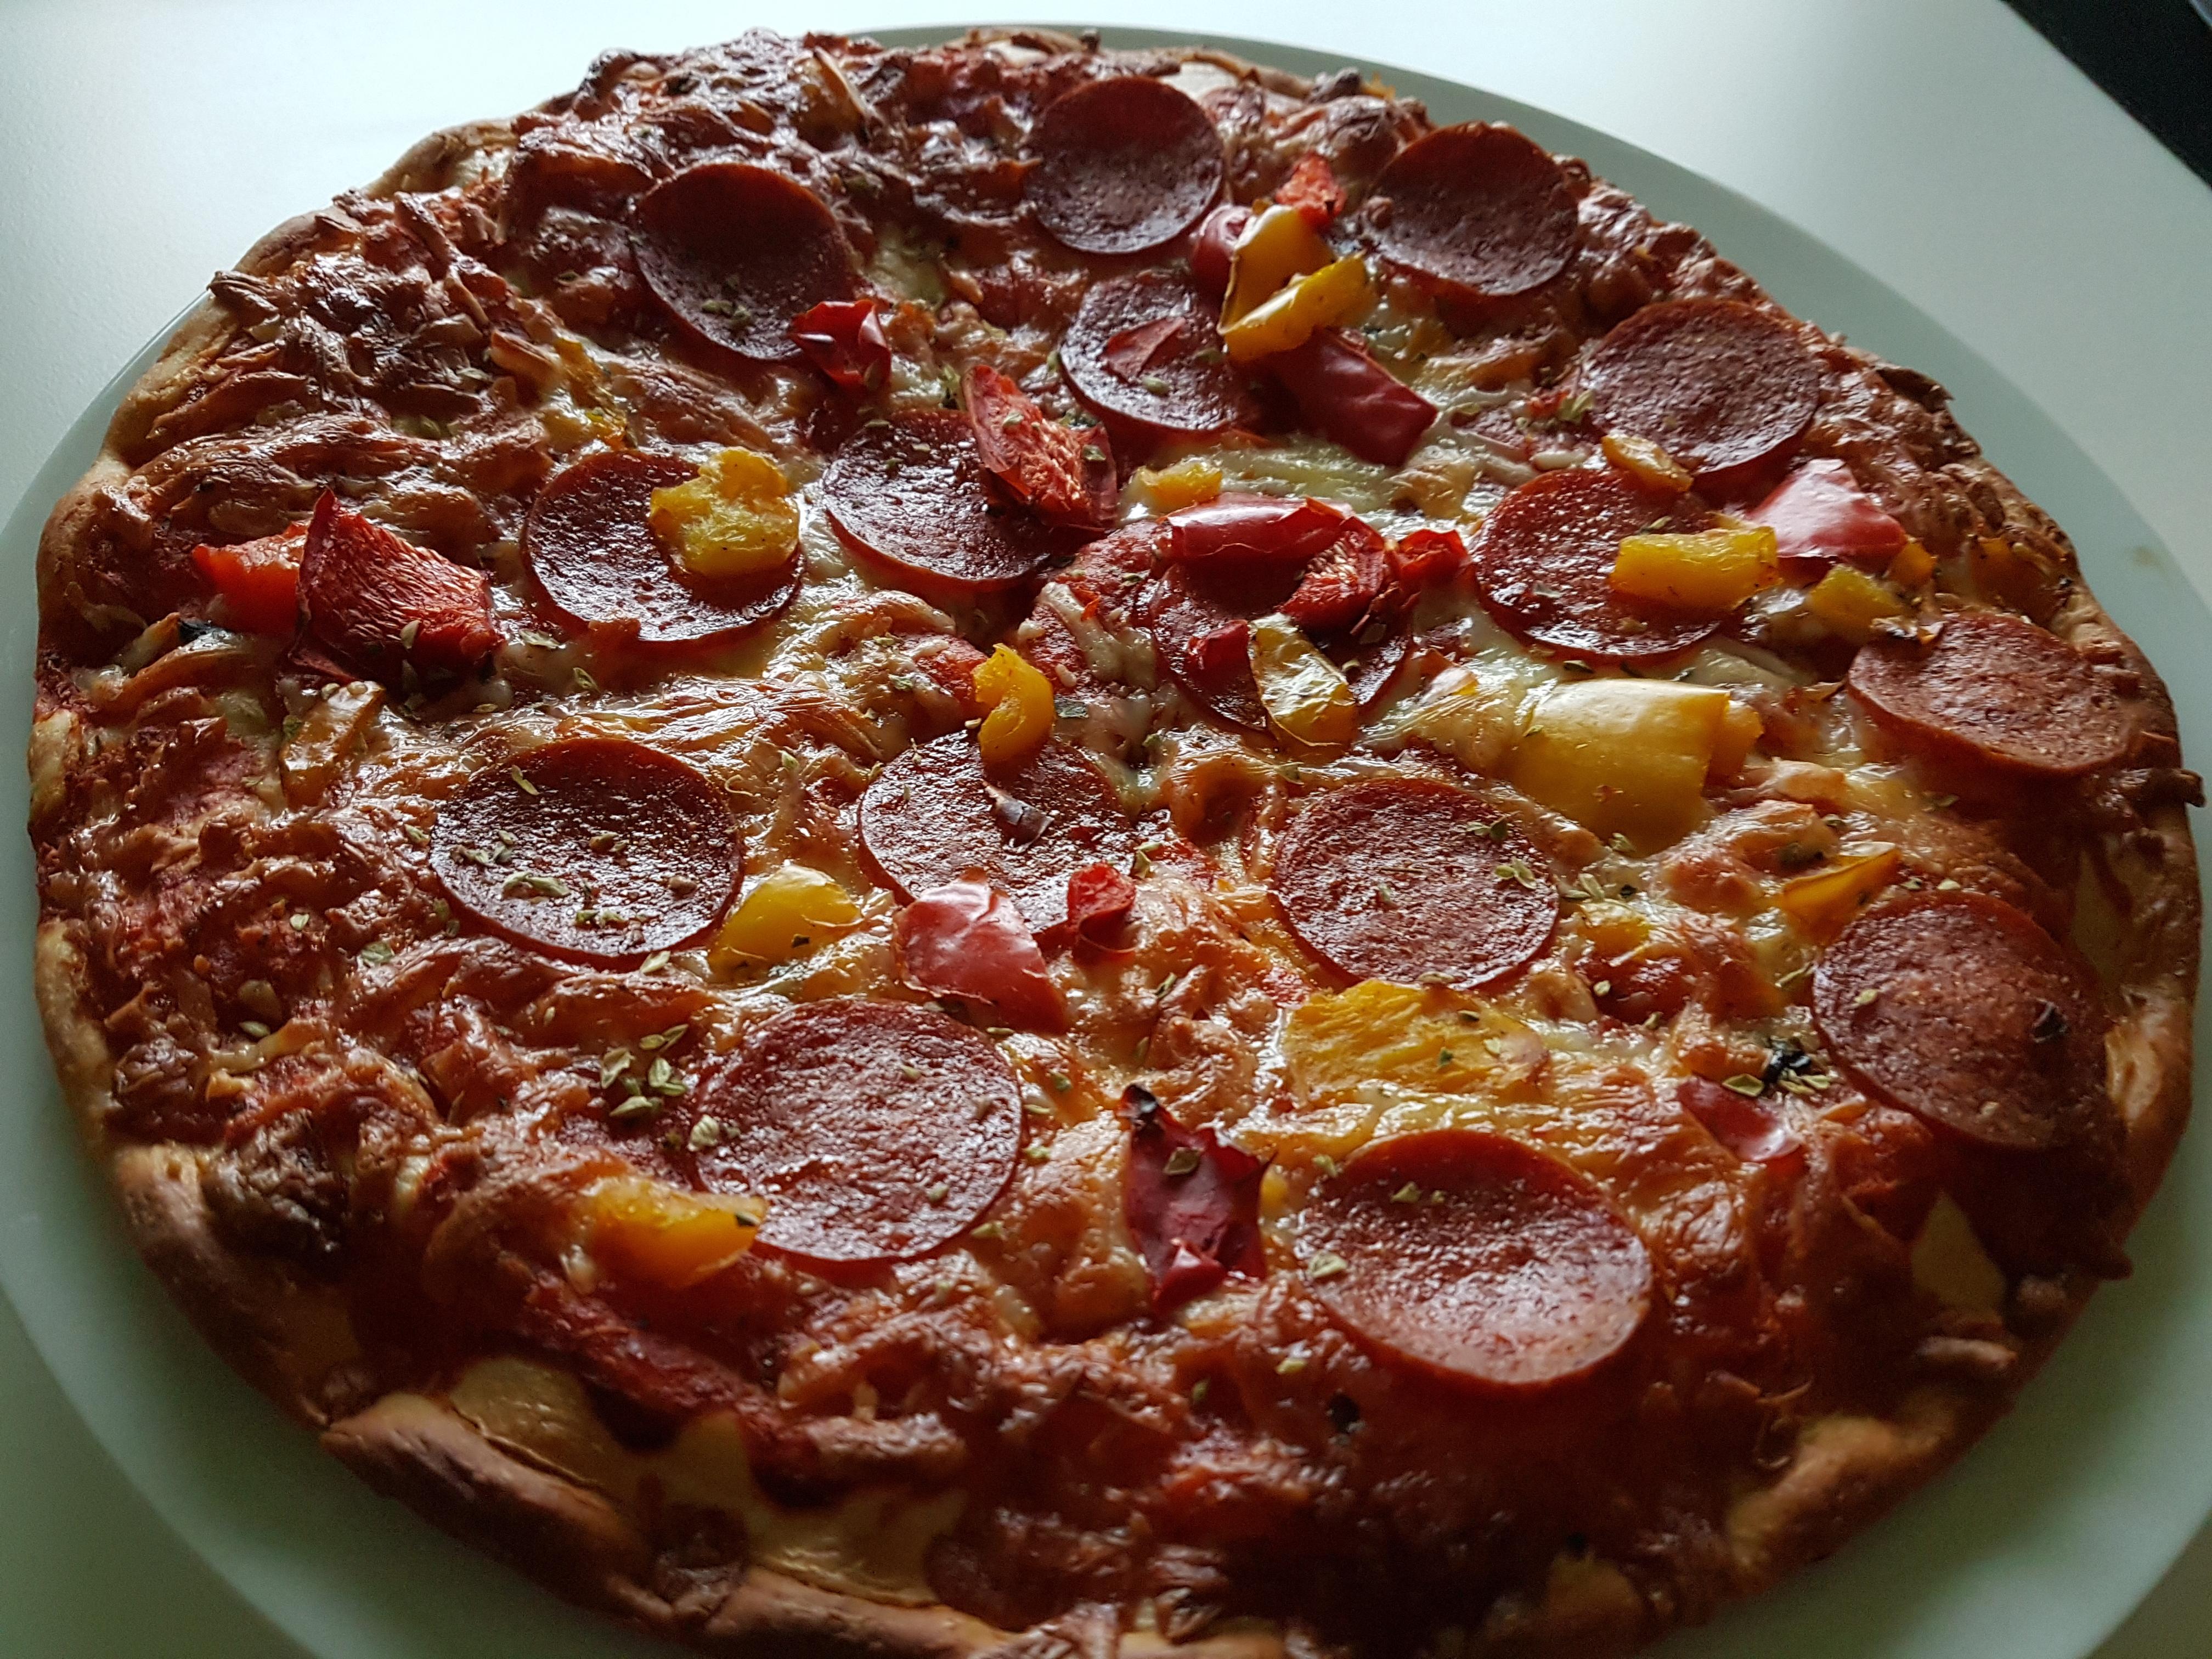 http://foodloader.net/Holz_2017-08-17_Pizza.jpg